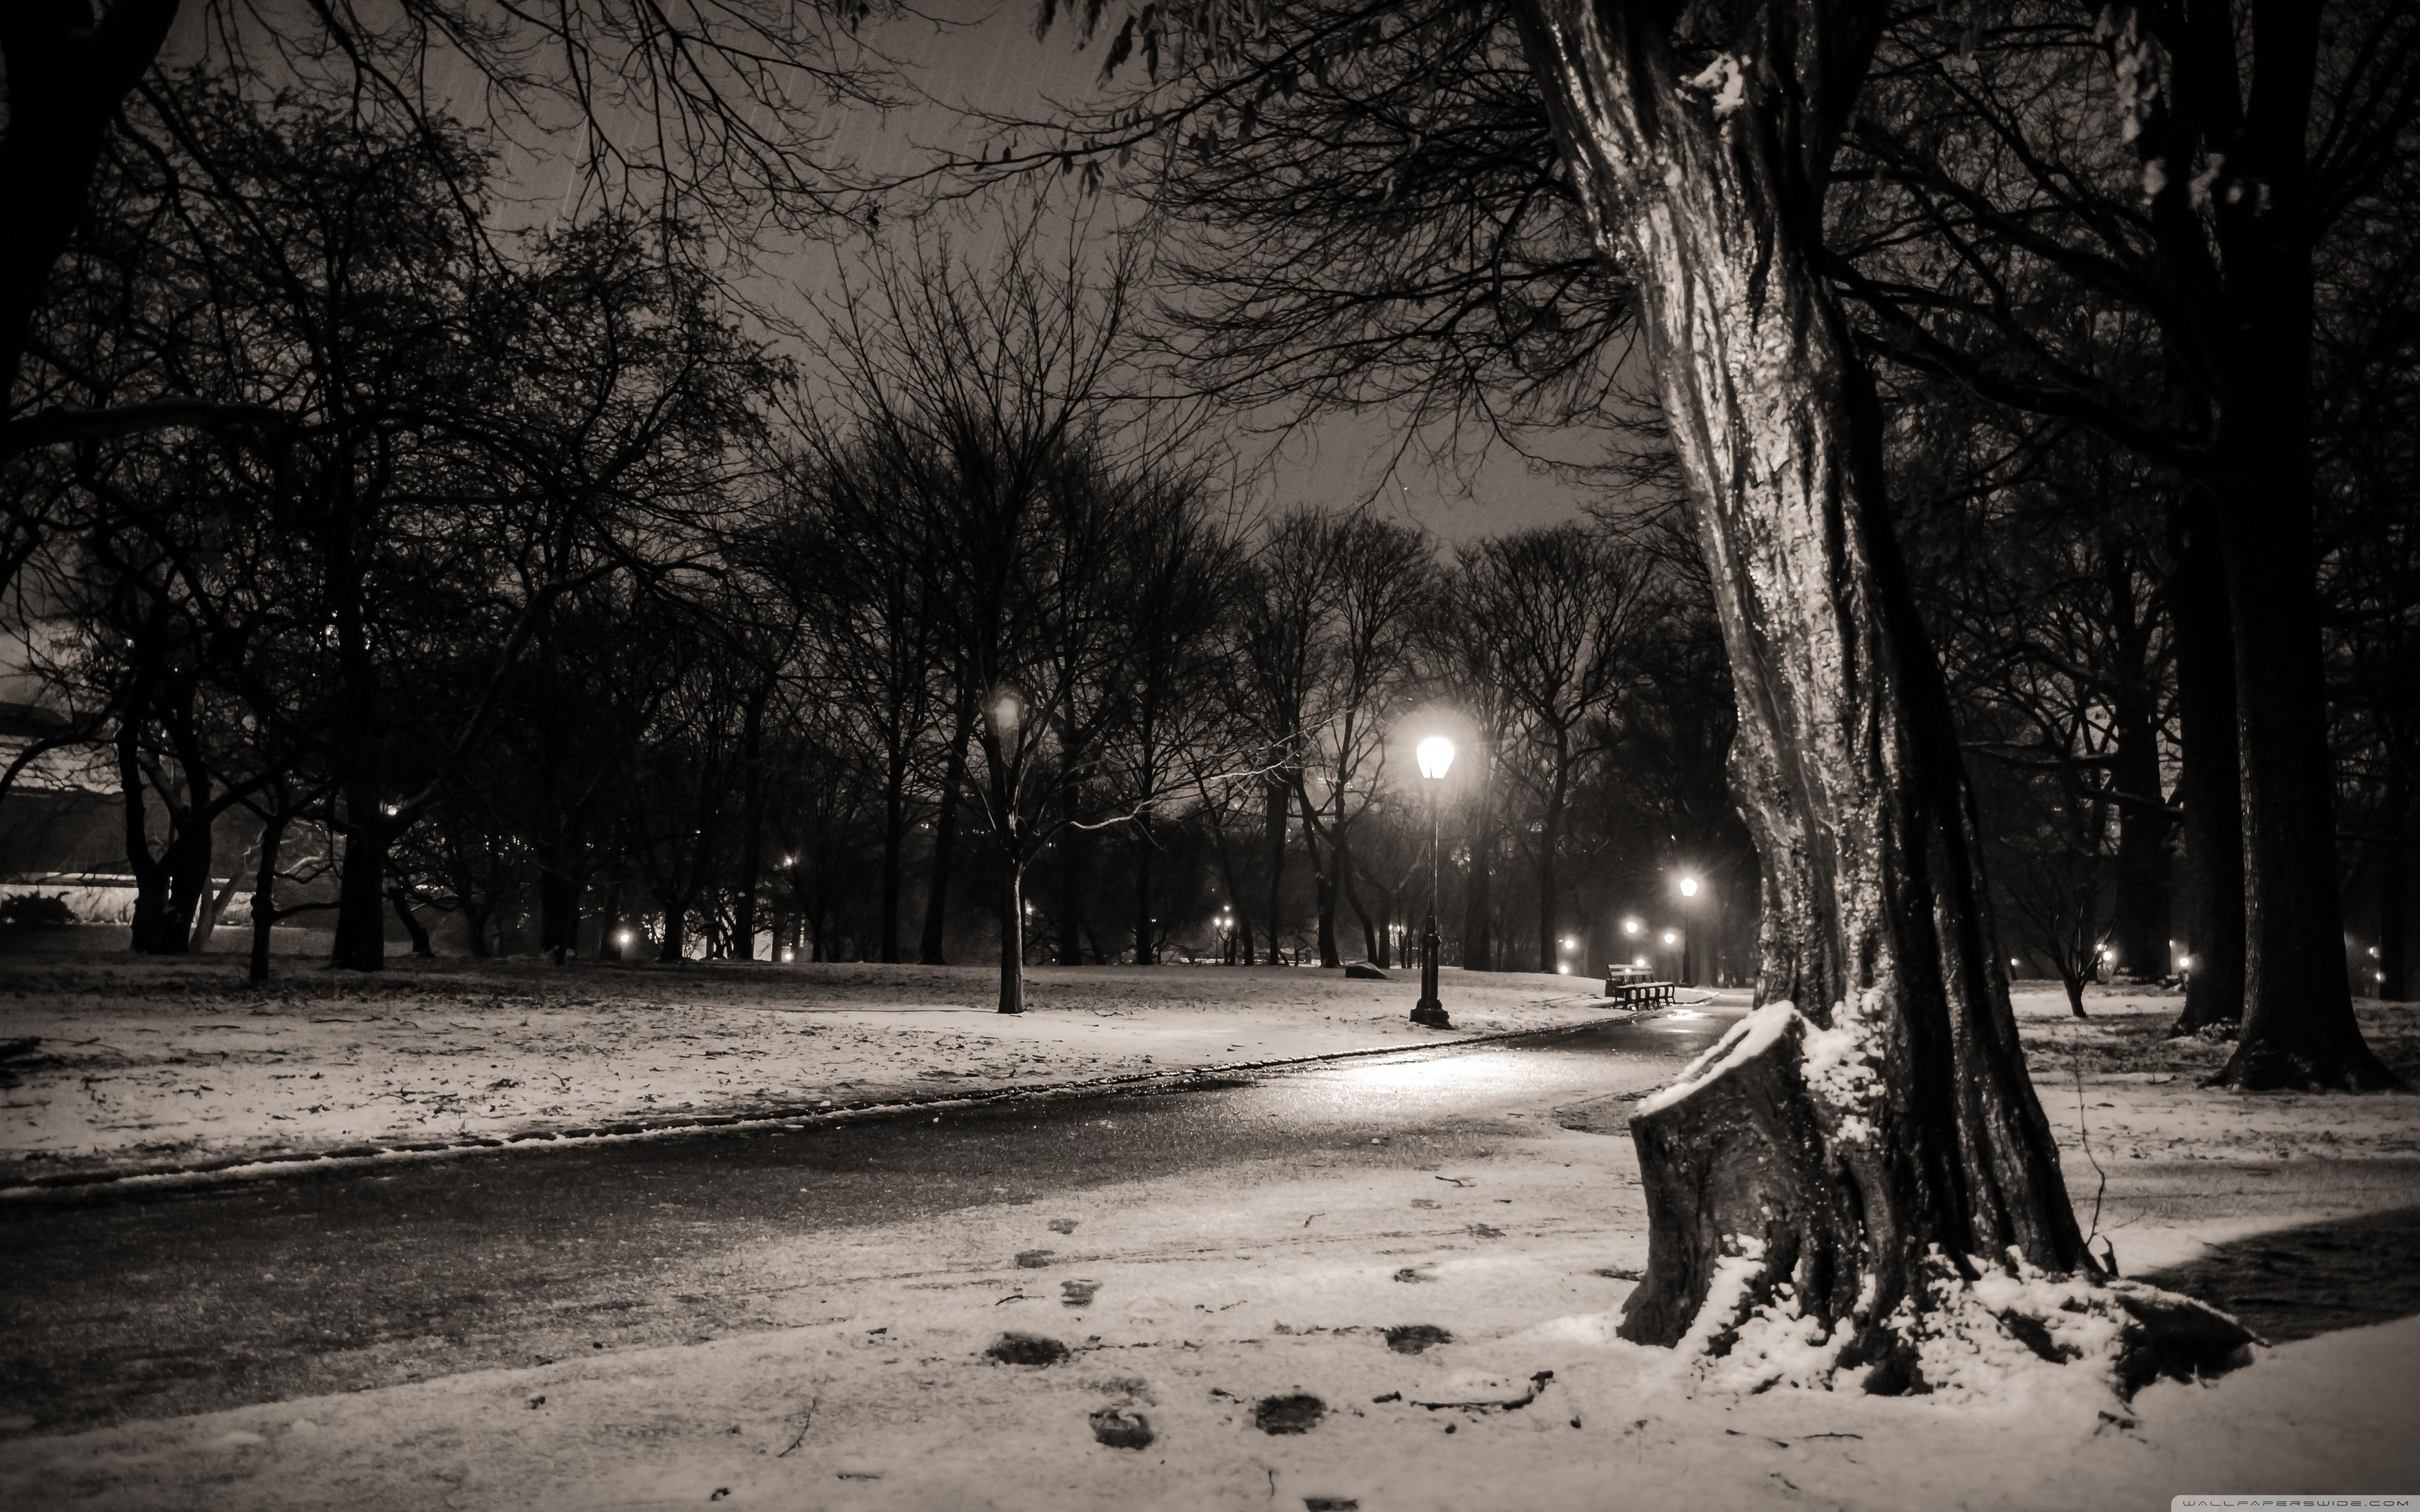 New York City Central Park Footsteps 4K HD Desktop Wallpaper 3840x2400